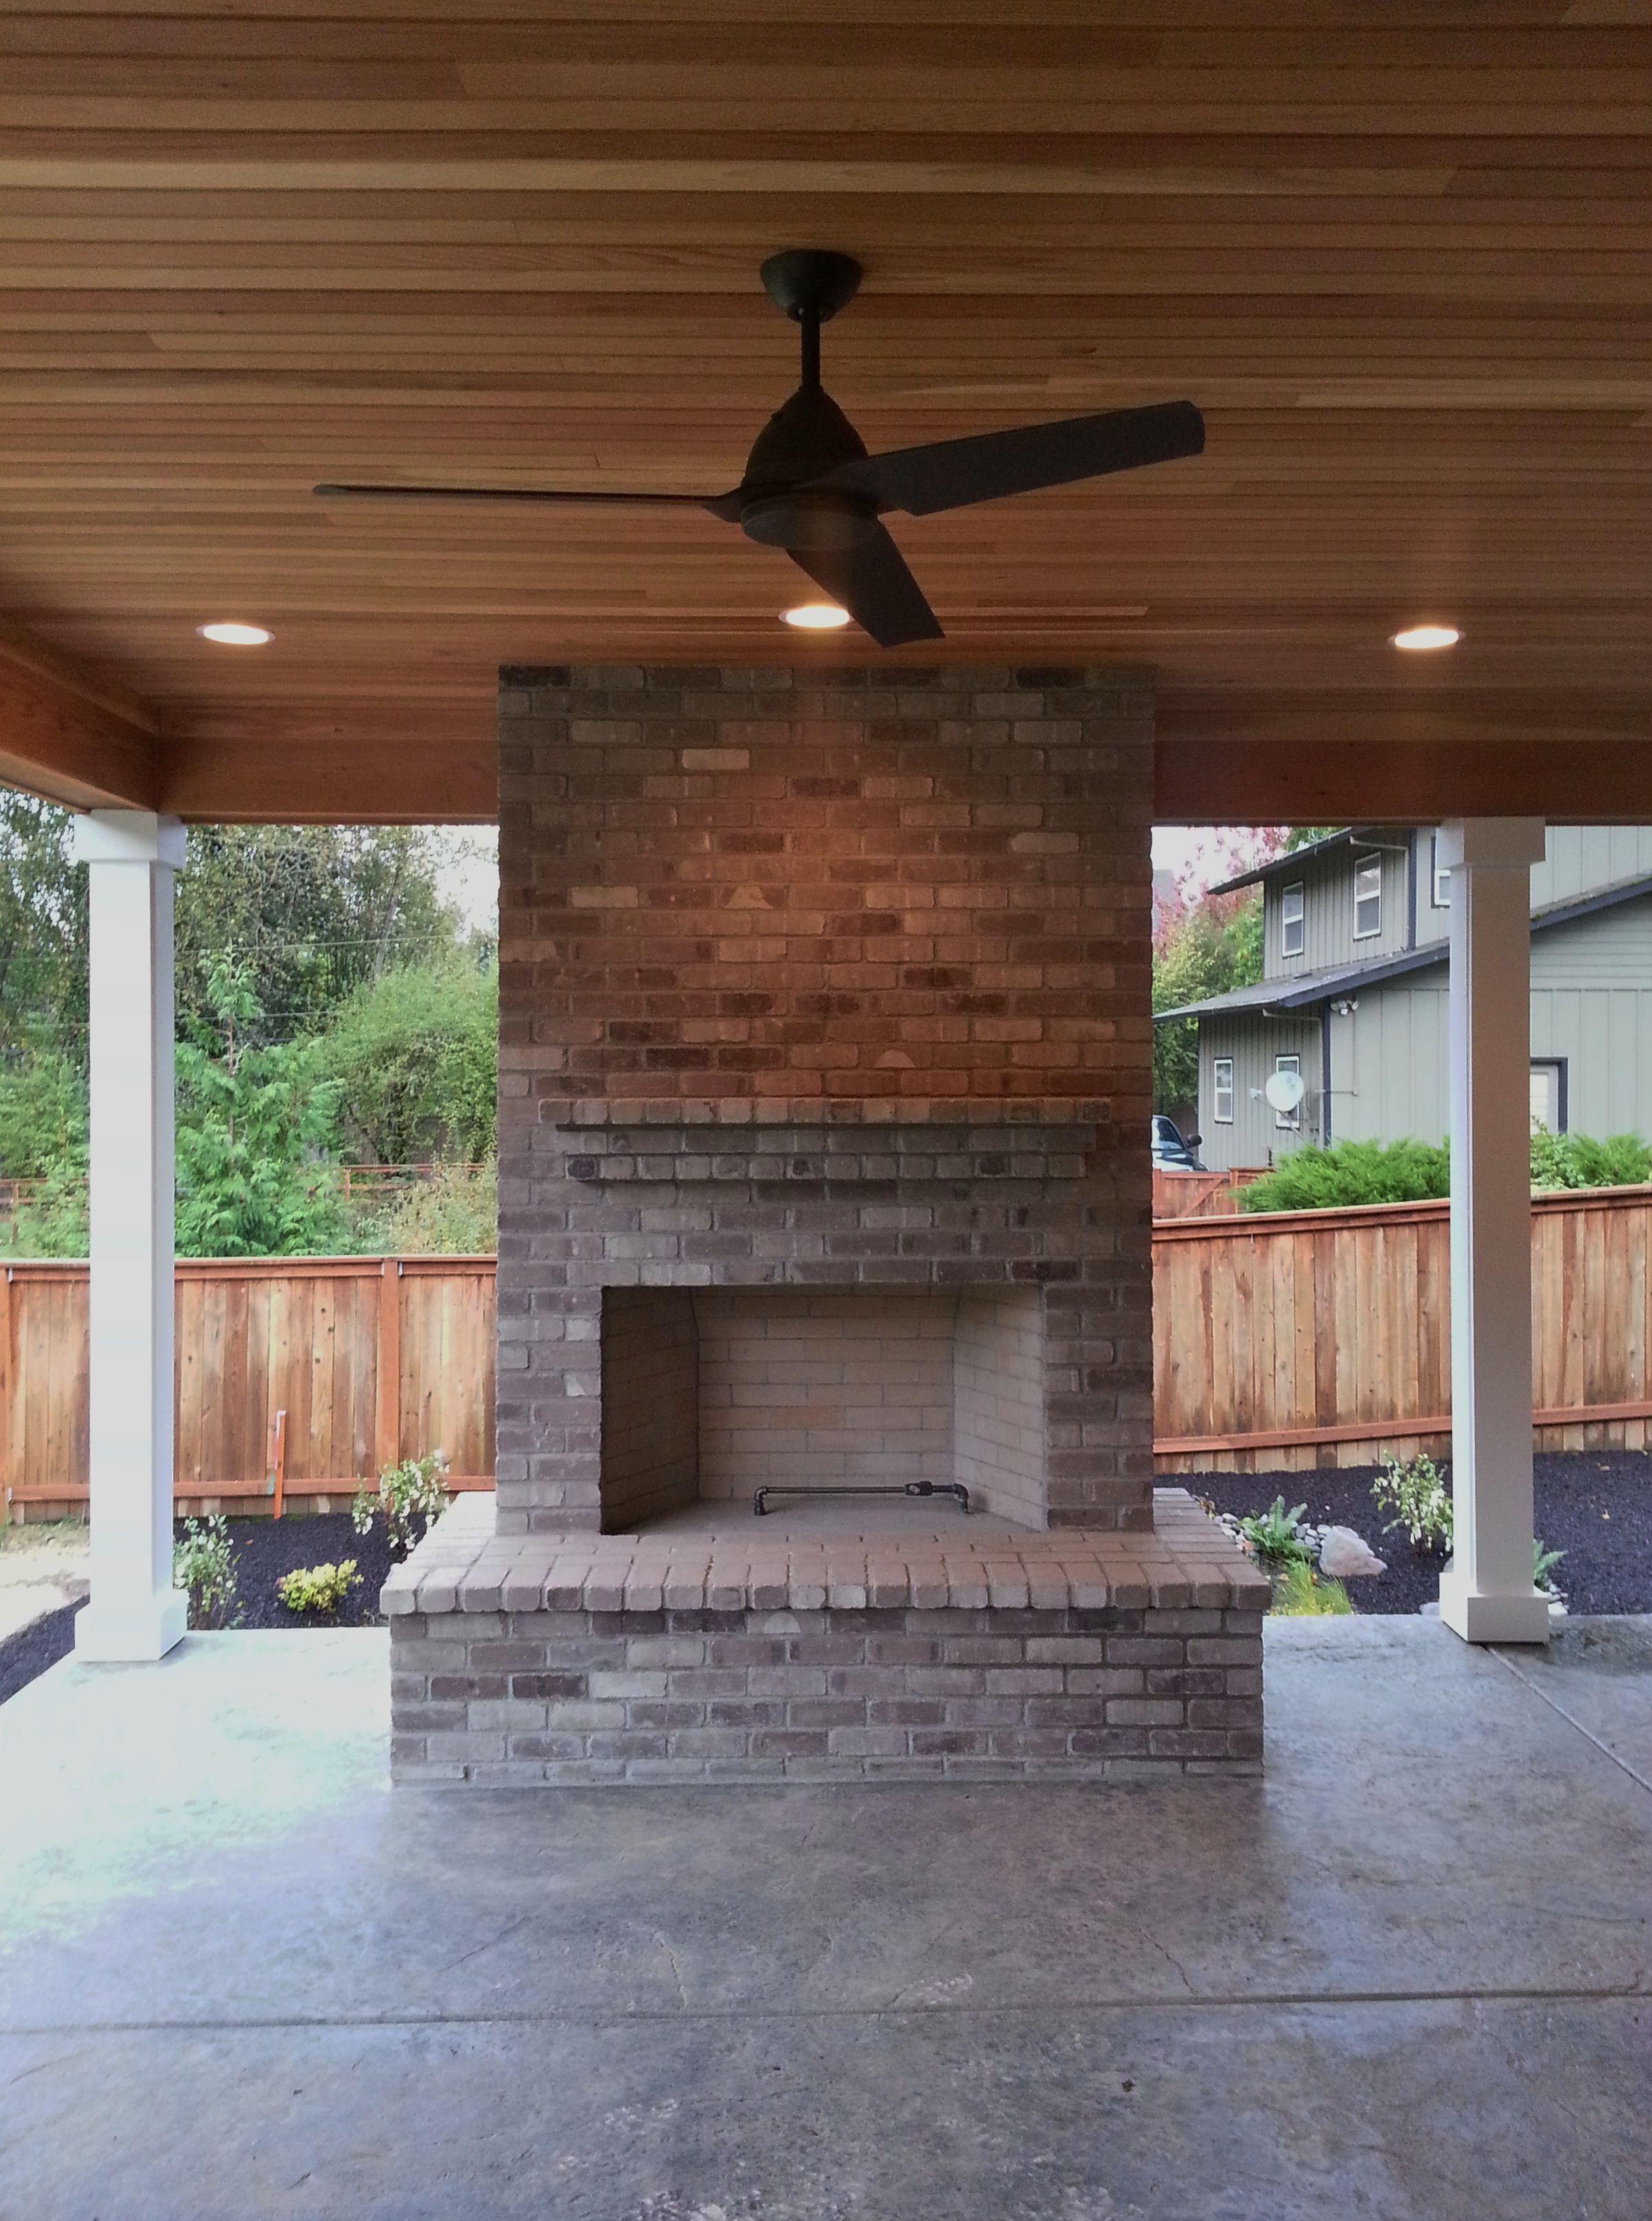 Outdoor Fireplace Brick Gray Brick Outdoor Living